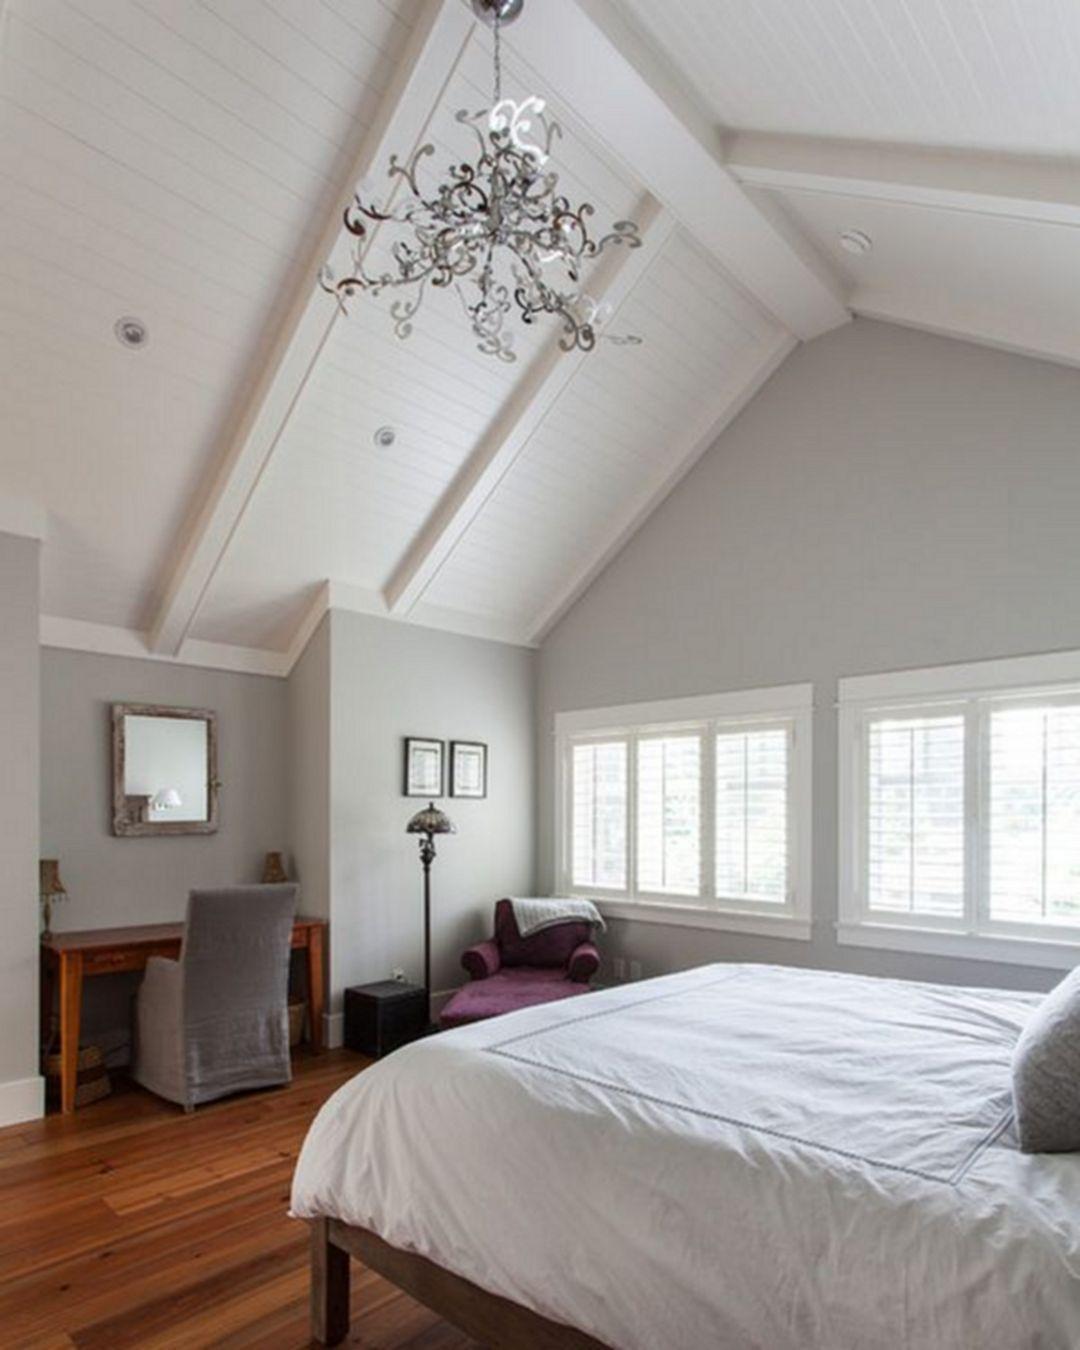 vaulted ceiling bedroom design ideas 241 - Inspirational Vaulted Ceiling Bedroom